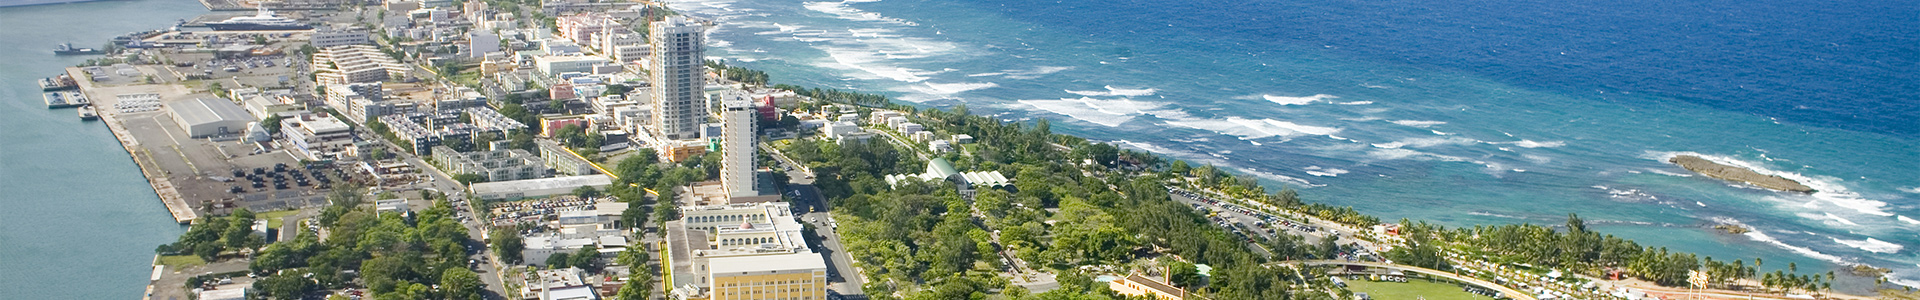 Puerto Rico Aerial Shot